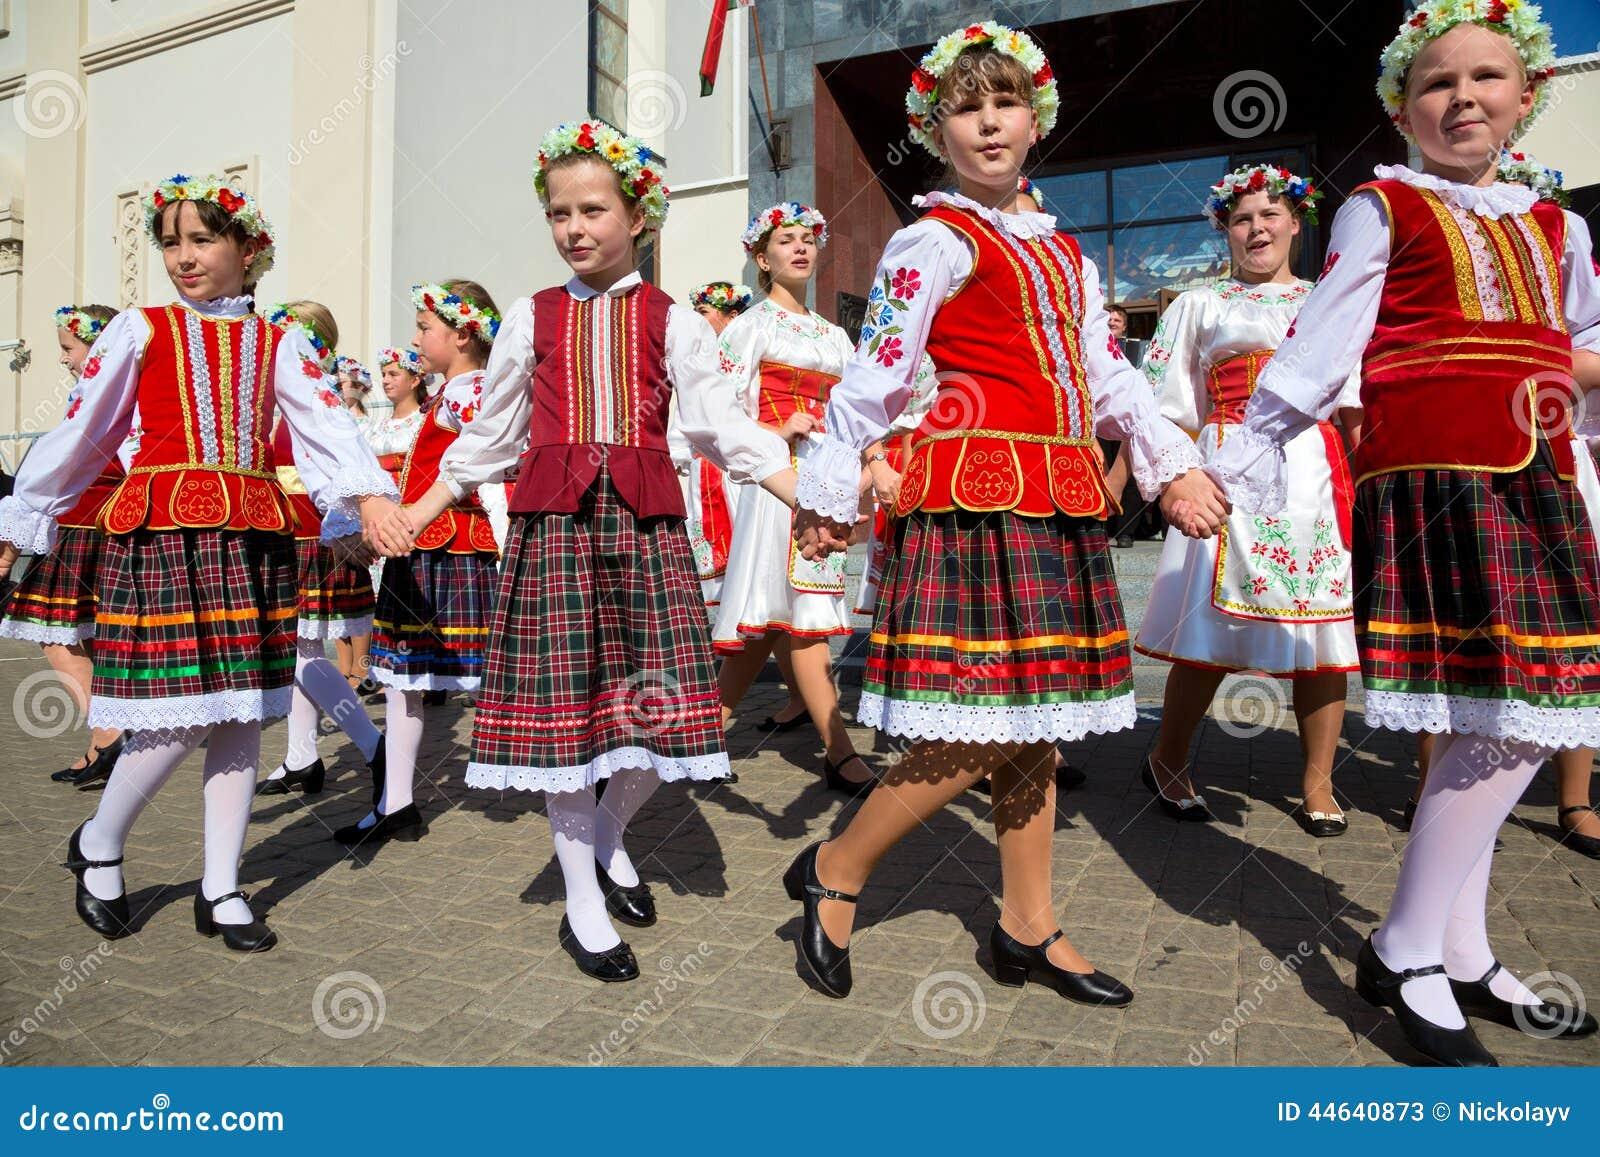 How Tankmen Day was celebrated in Minsk 61